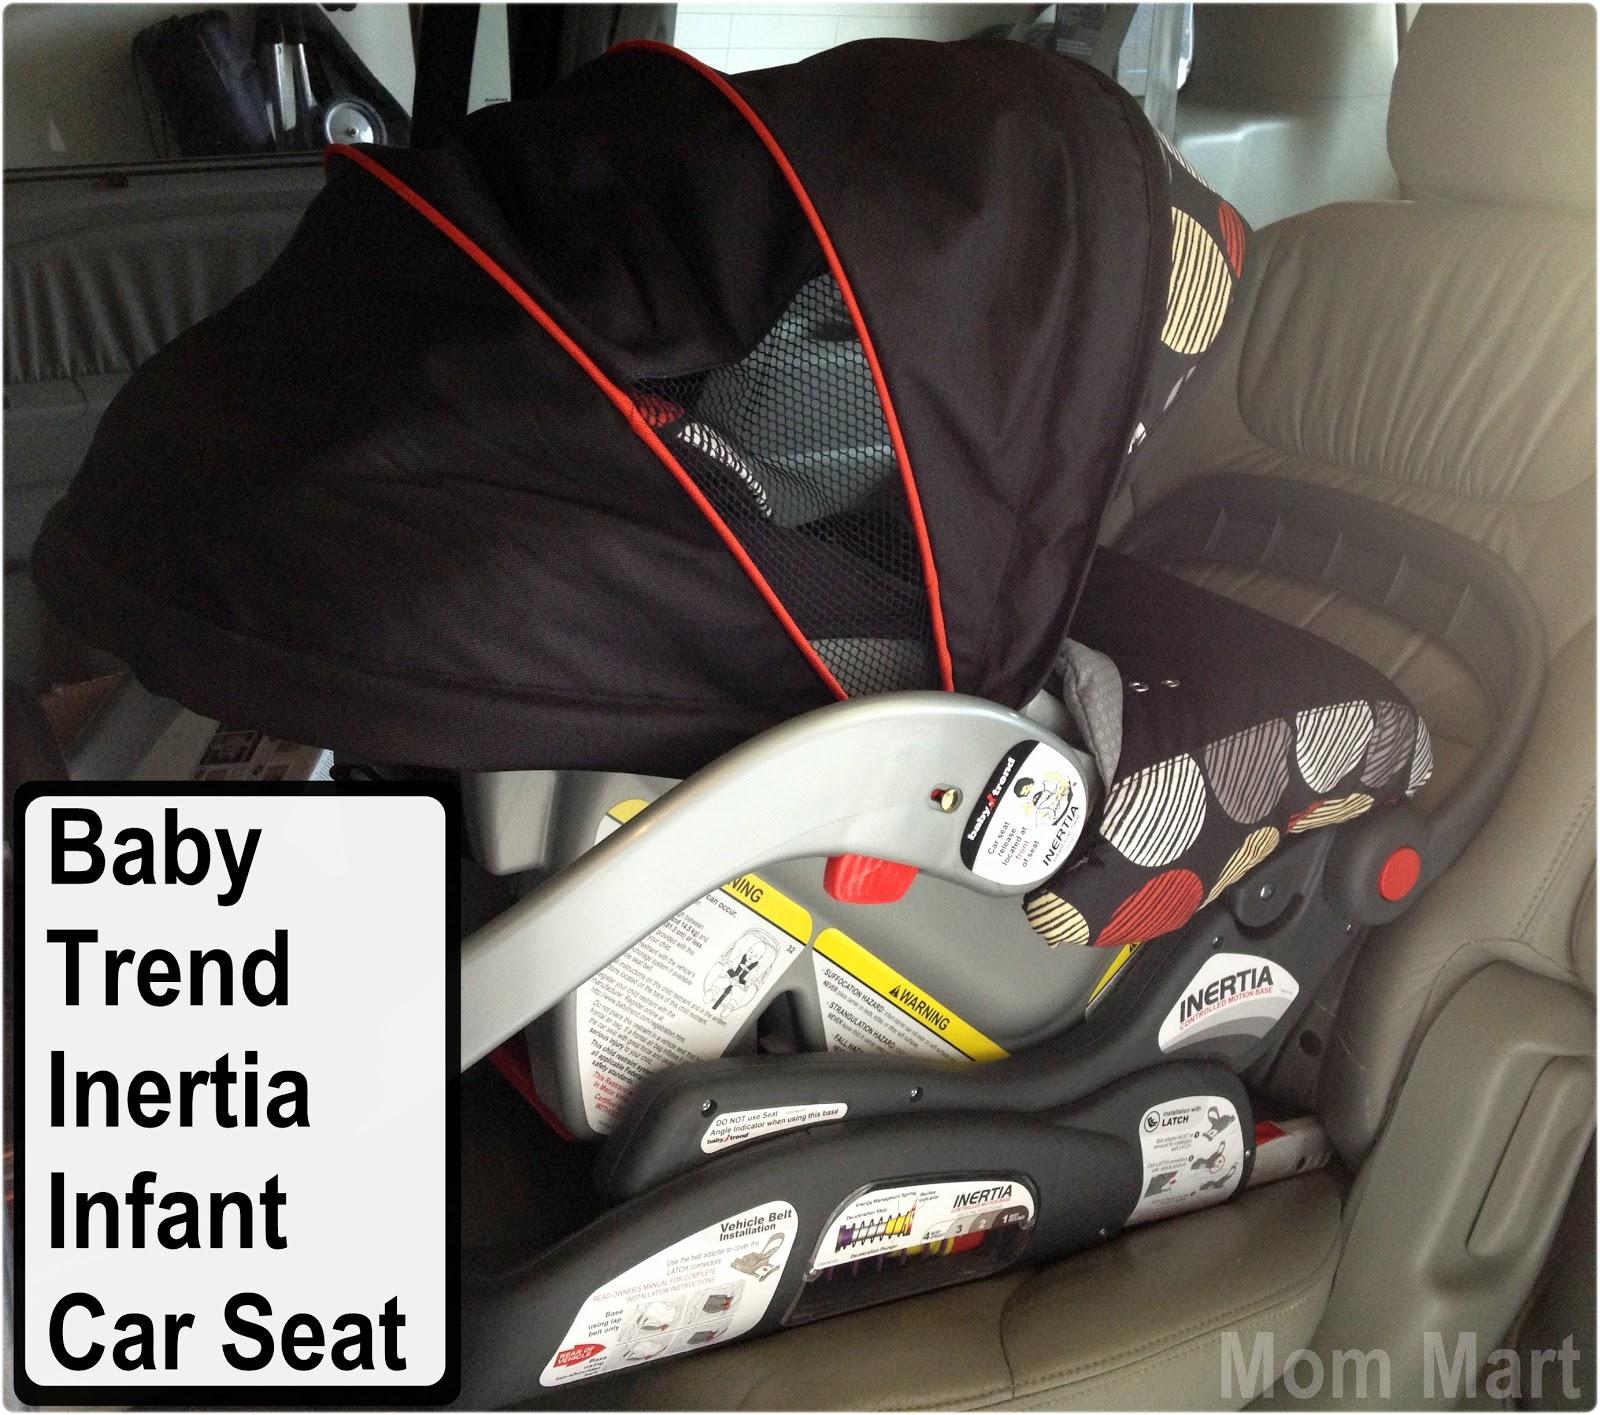 Mom Mart Baby Trend Inertia Infant Car Seat